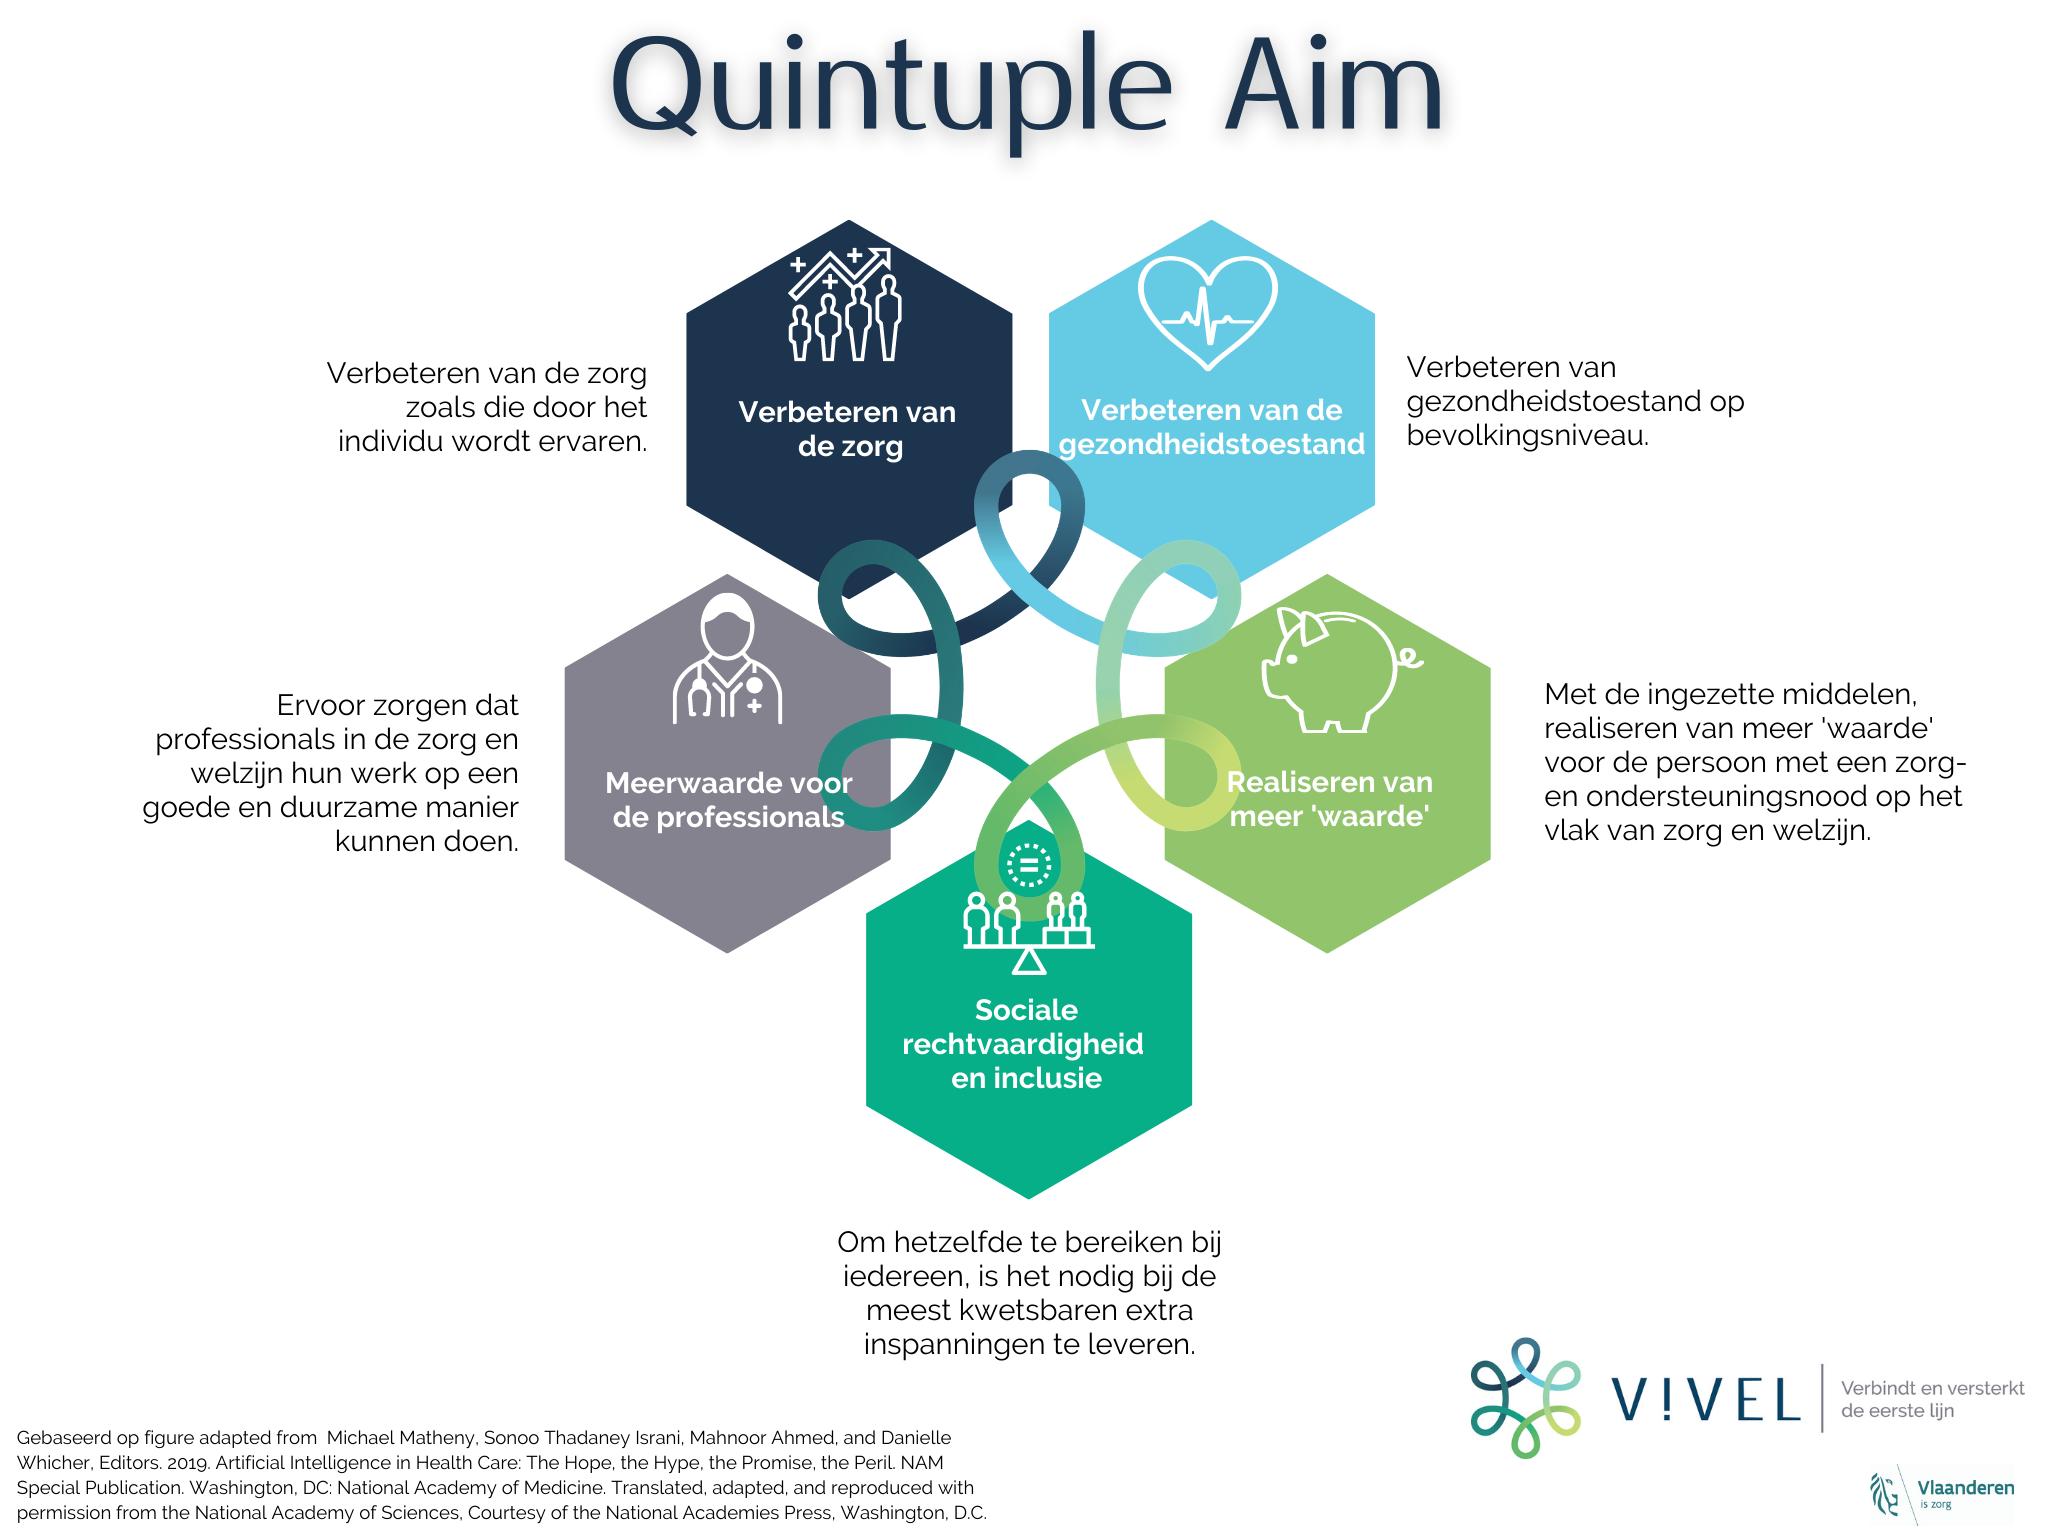 Quintuple Aim